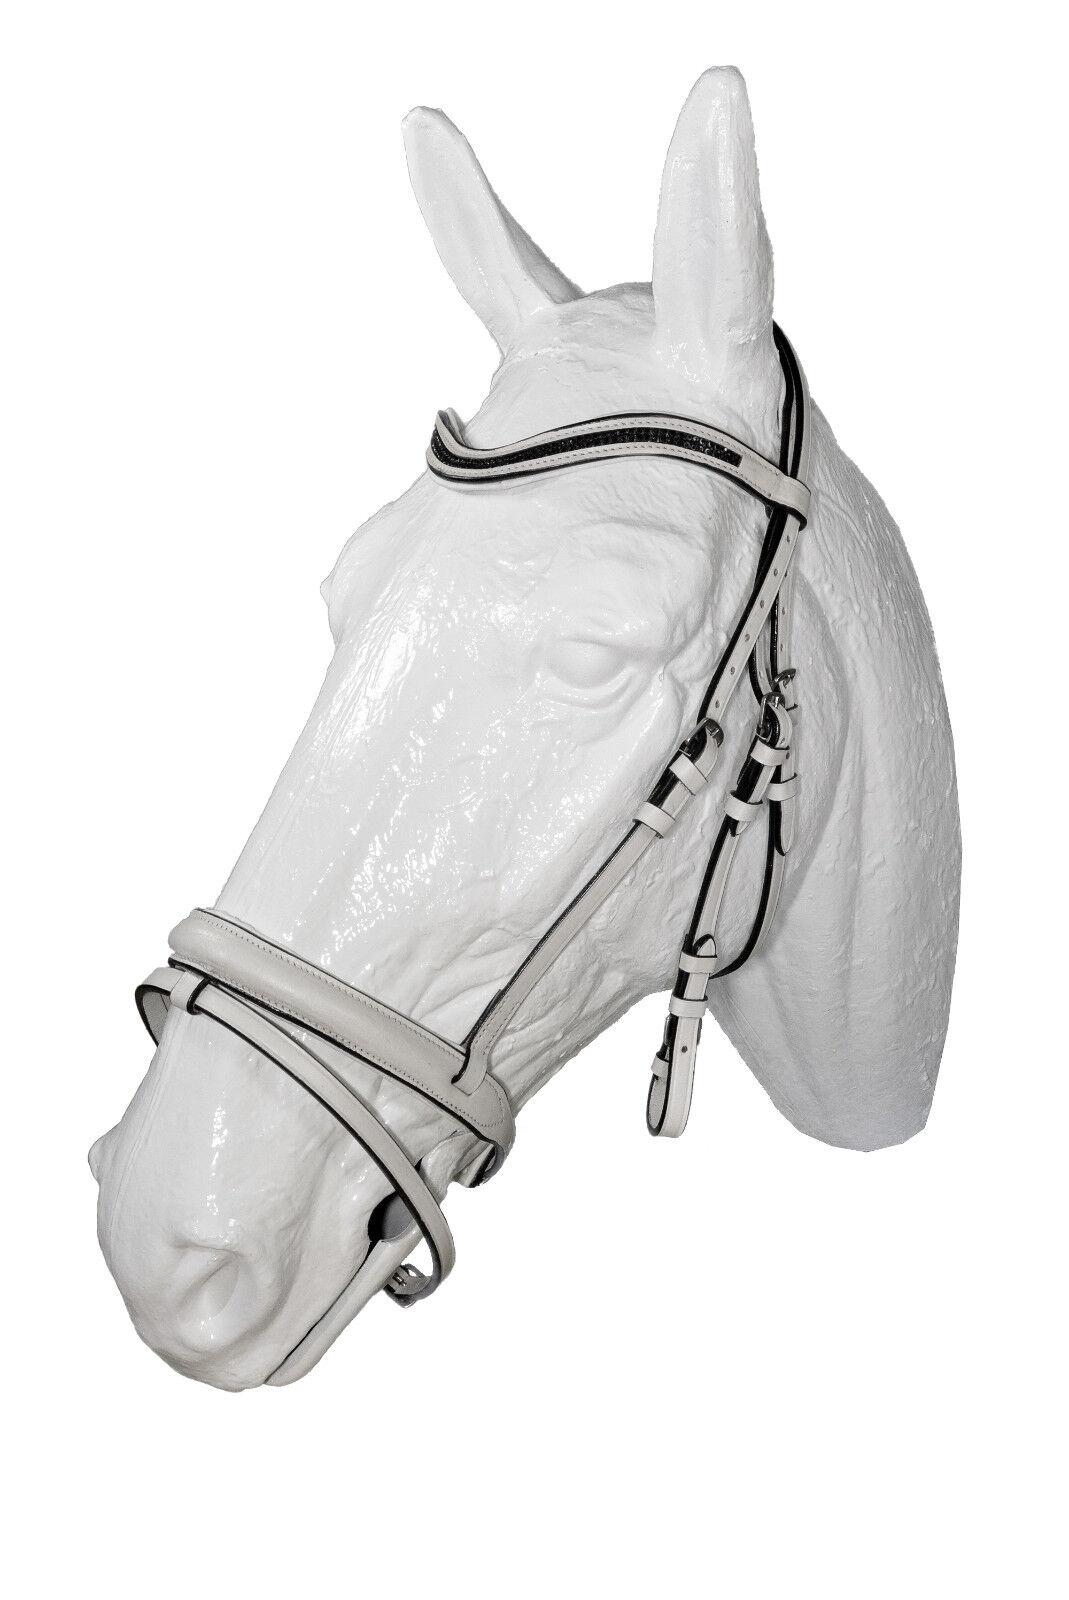 Esperia Dressur Trense Voltegieren COB/Full/Pony weiß Zügel Leder; K25 150